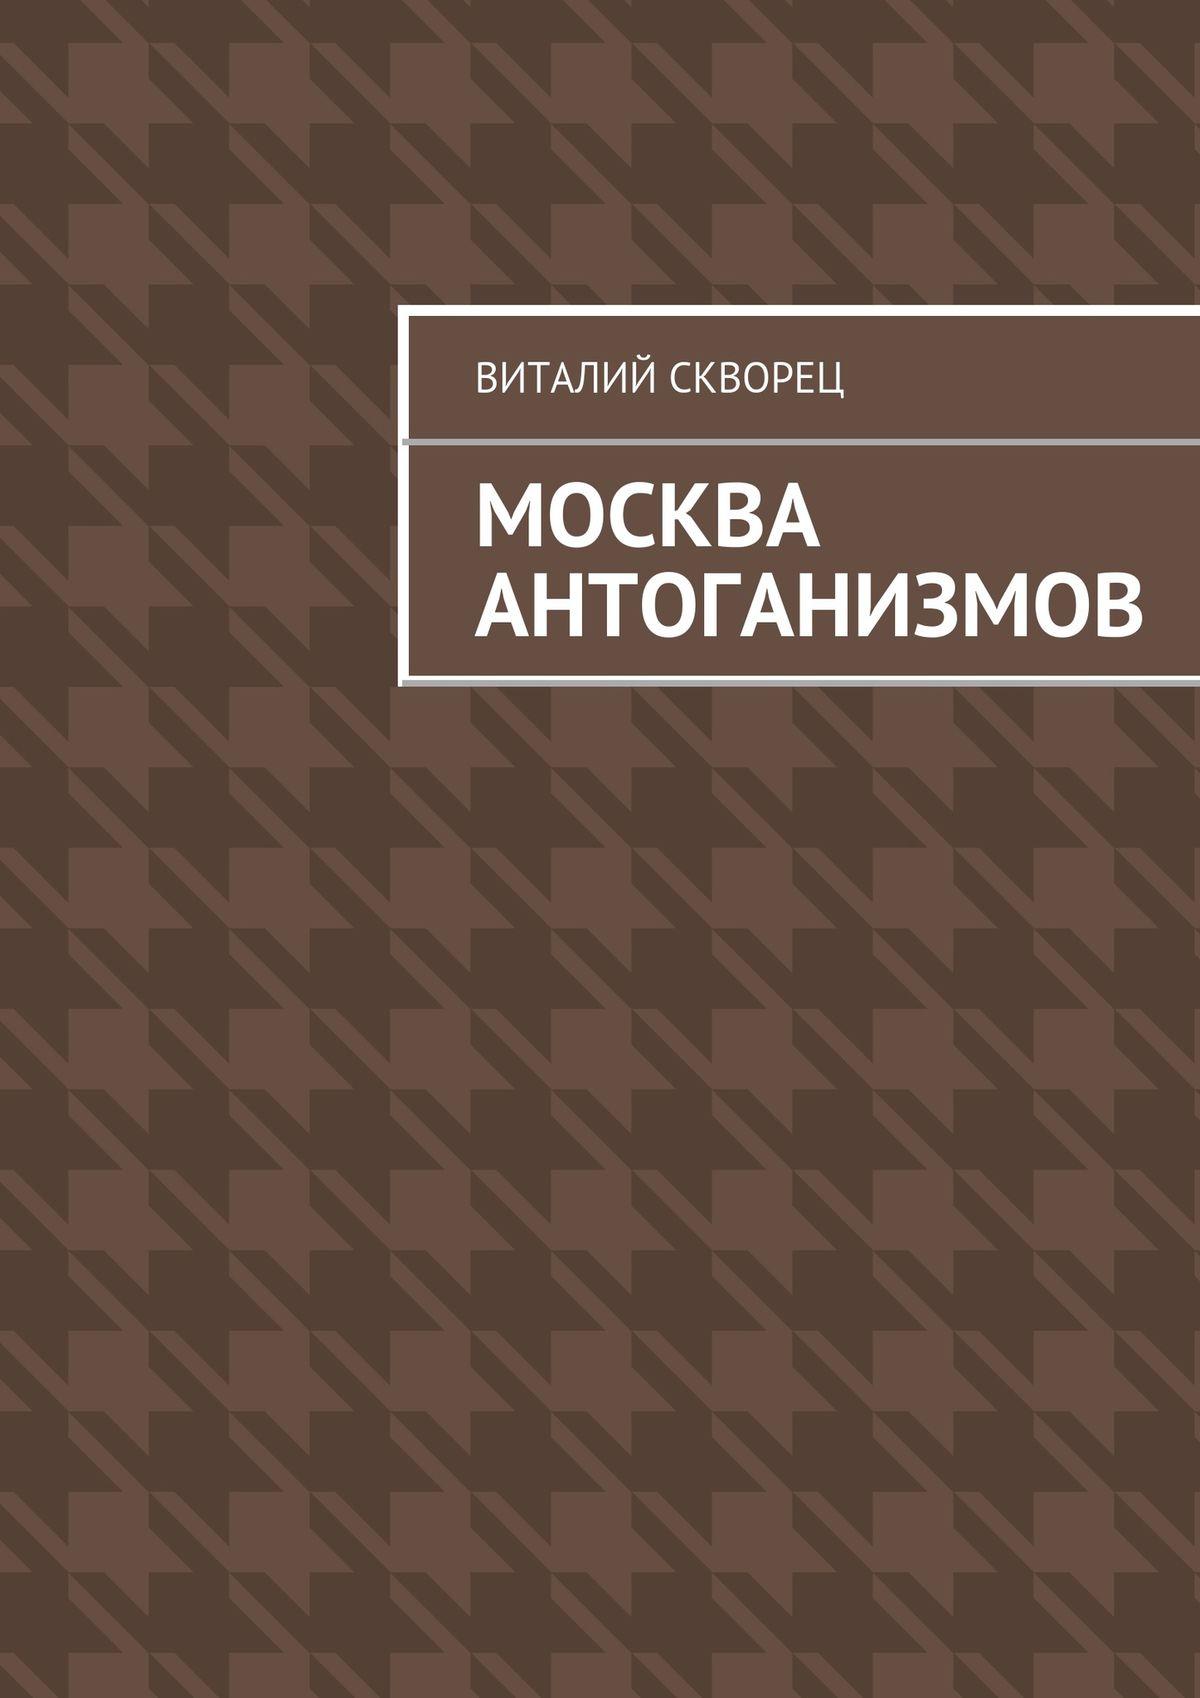 Москва антоганизмов